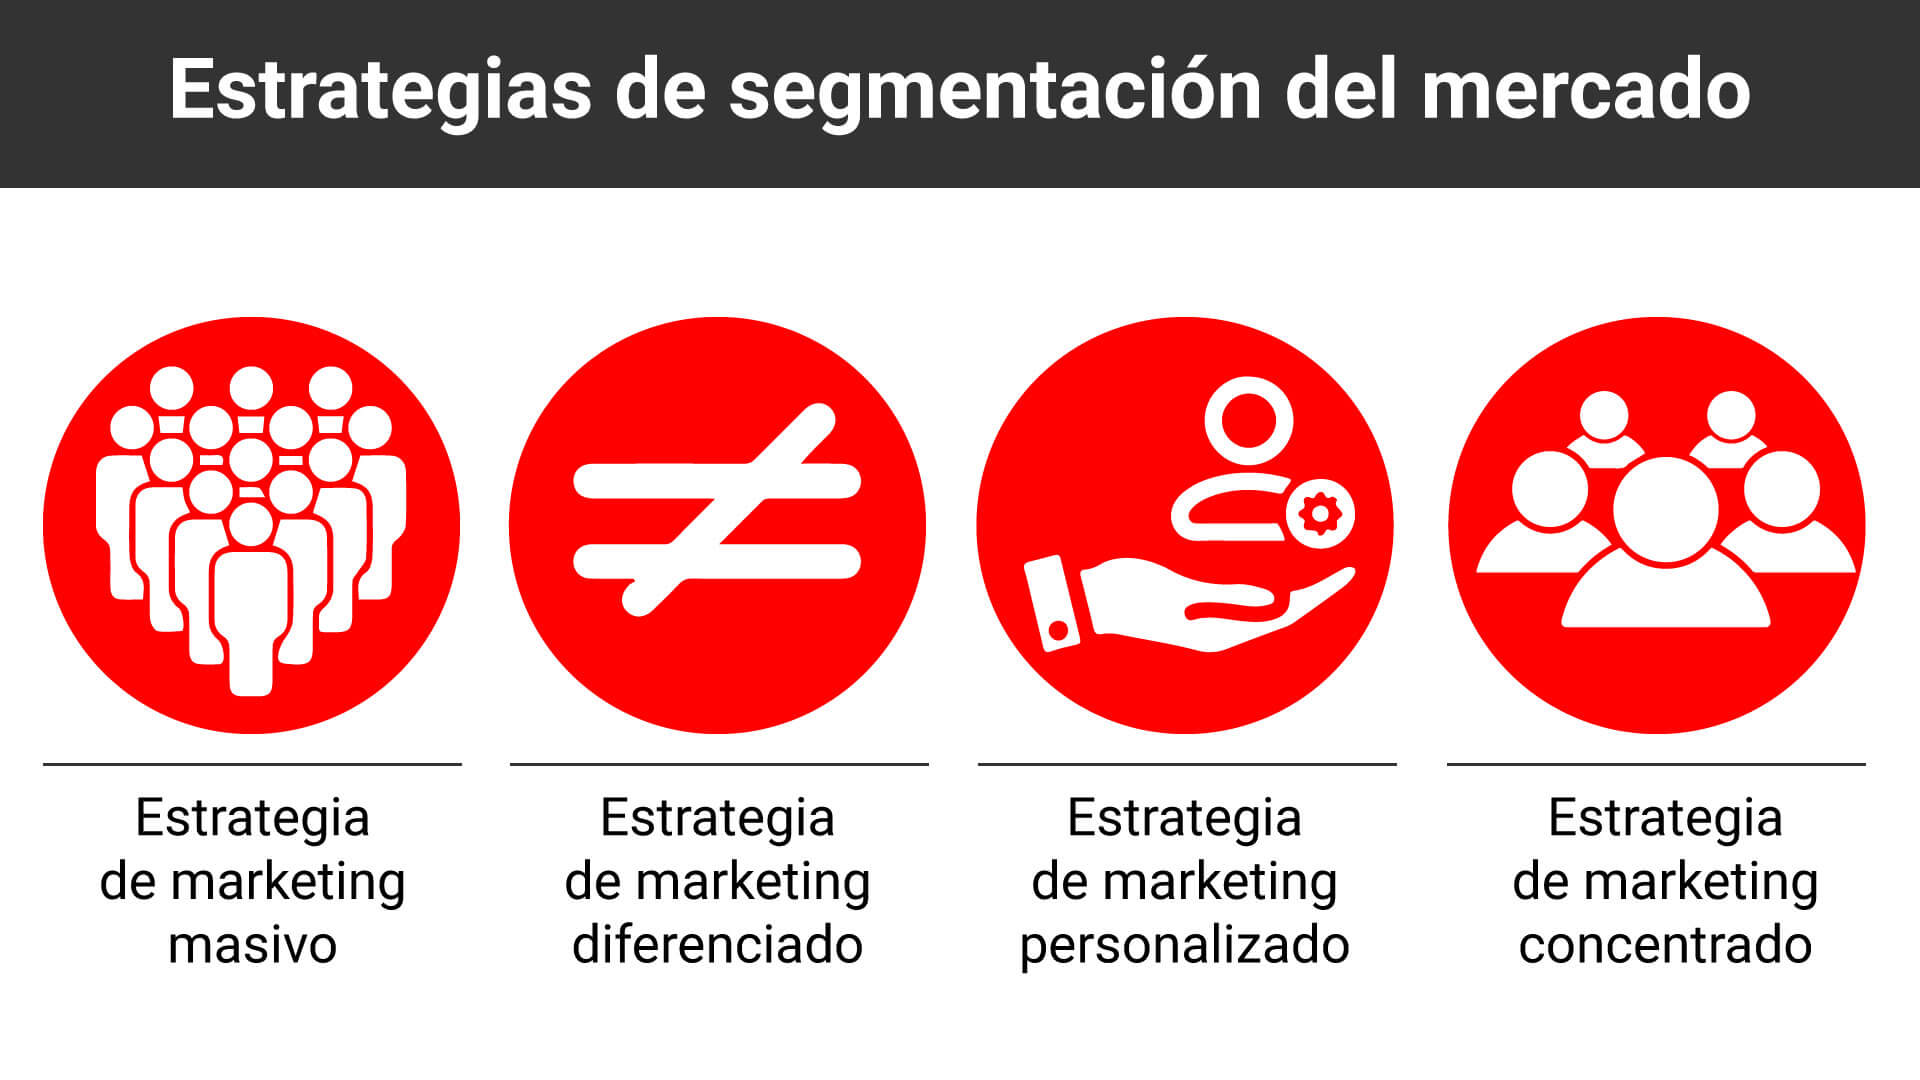 Estrategias de segmentacion de mercado